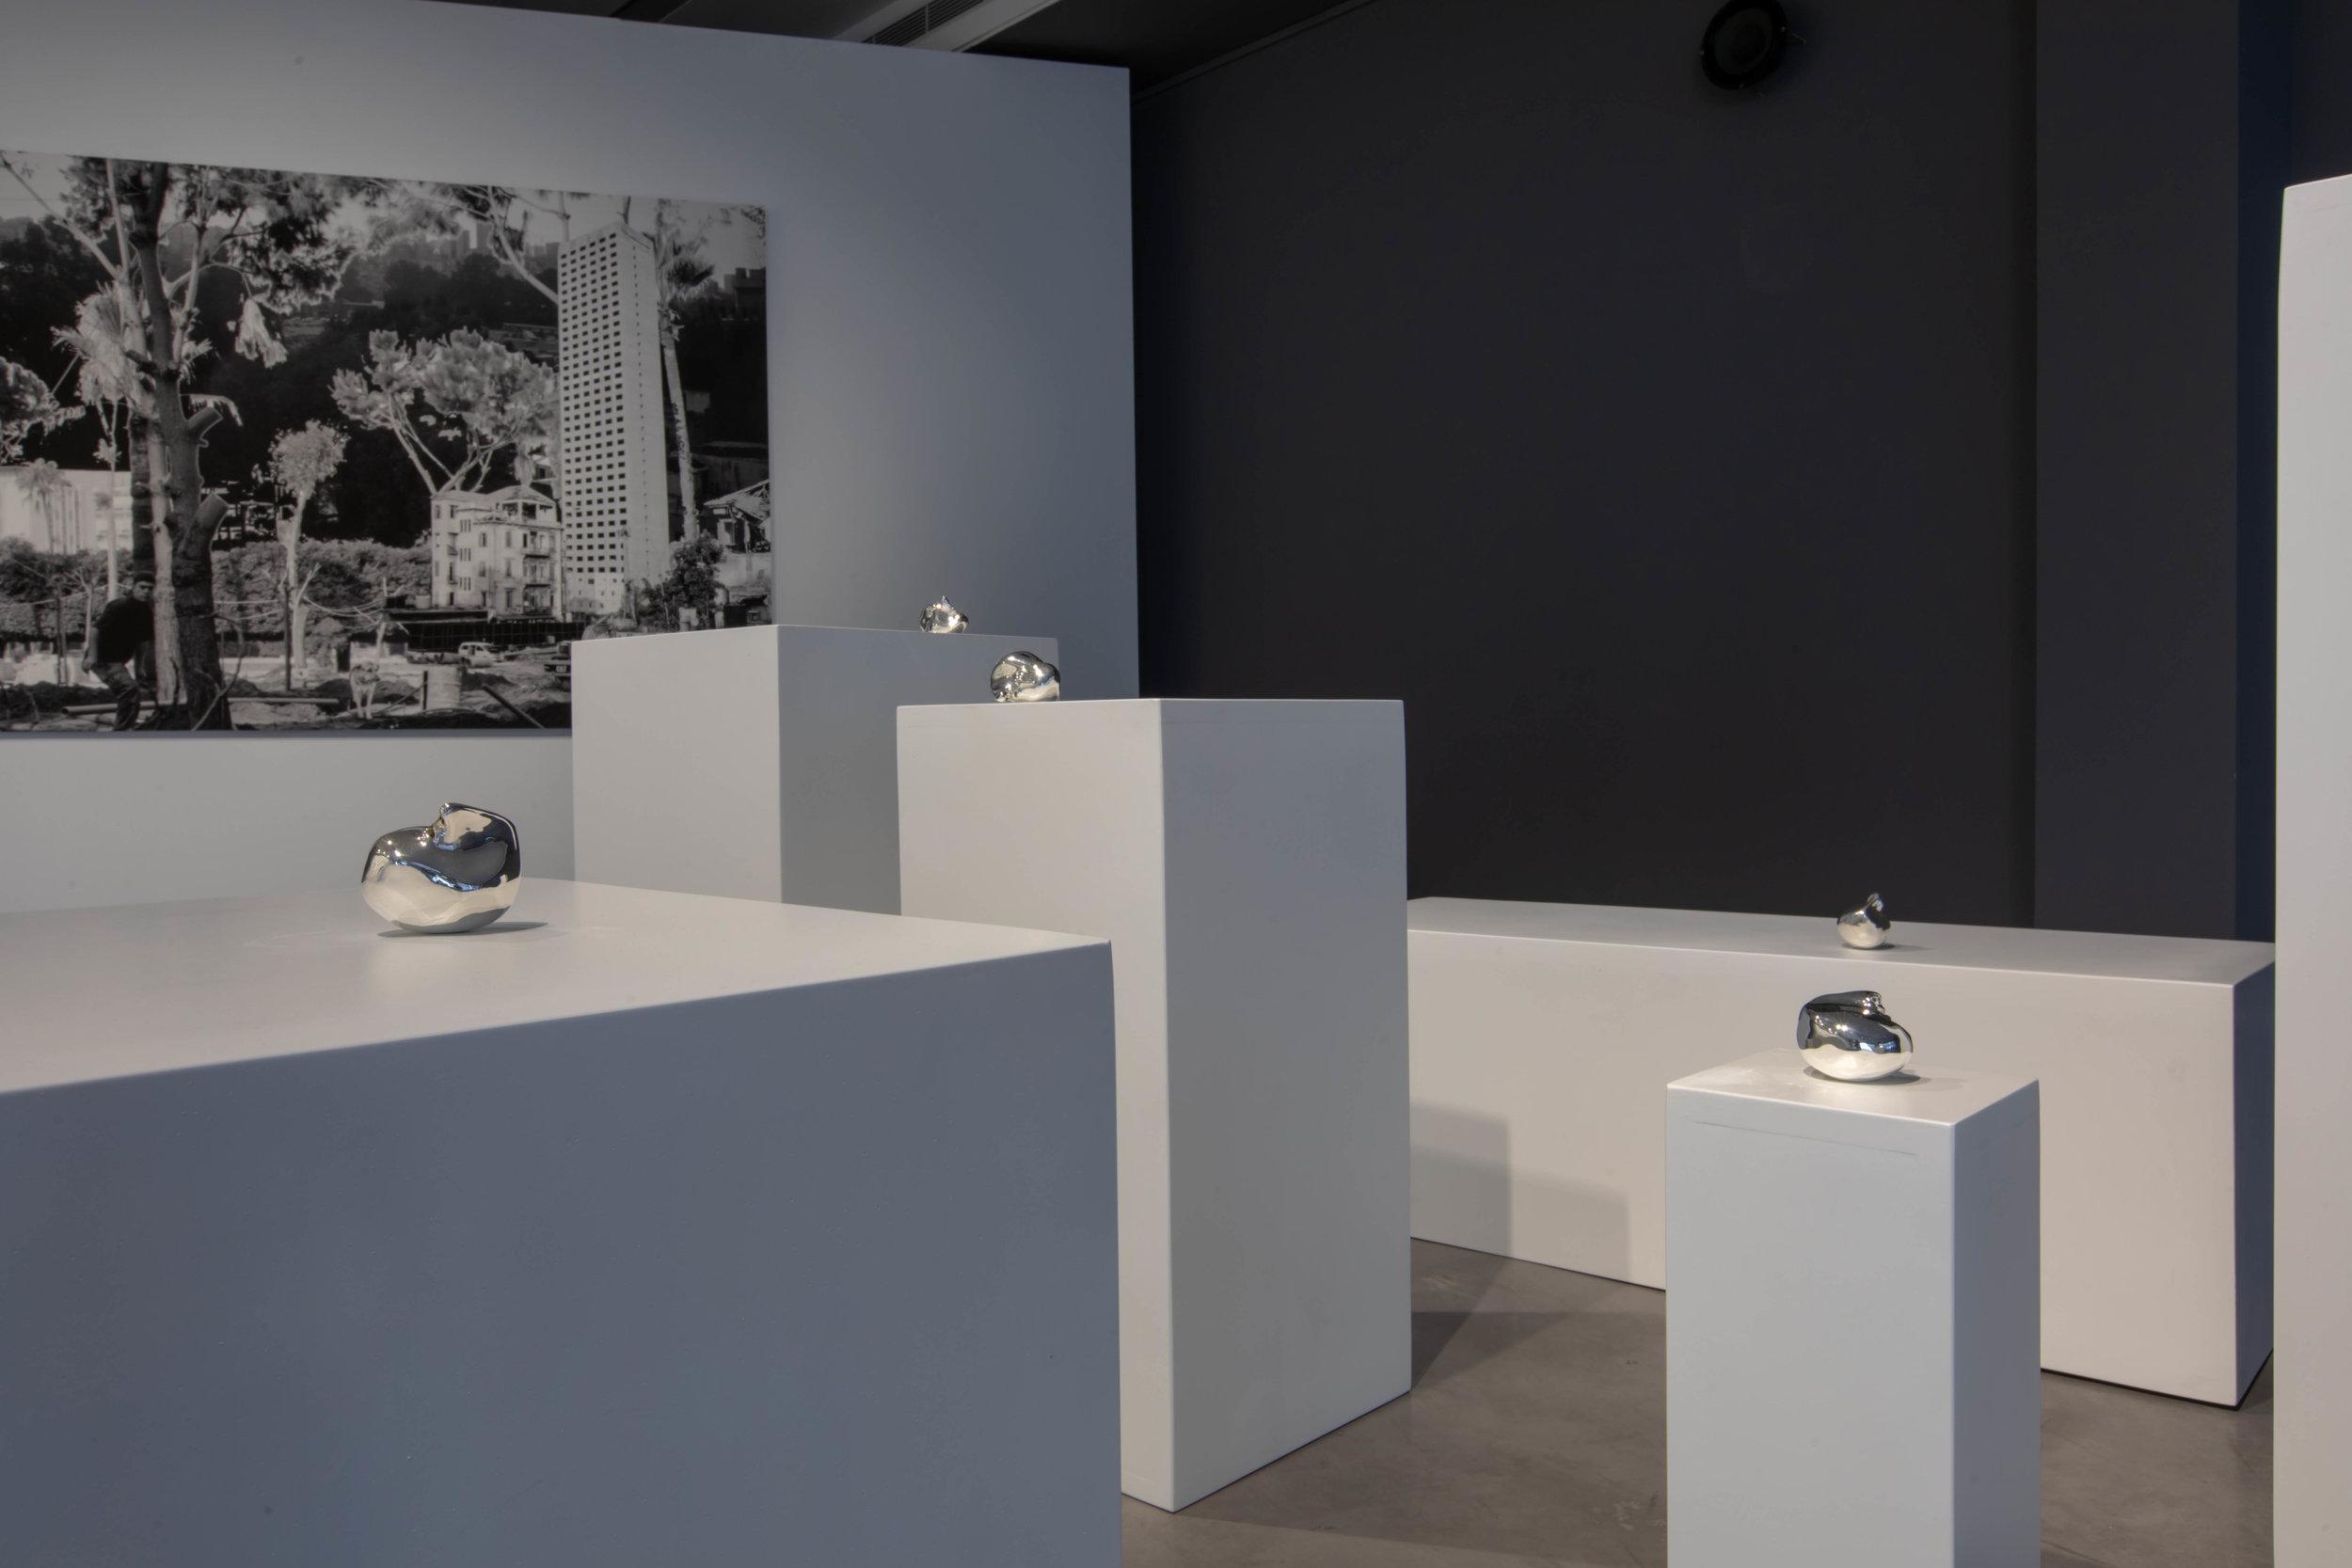 Letitia Gallery, Beirut, Lebanon, 2019.